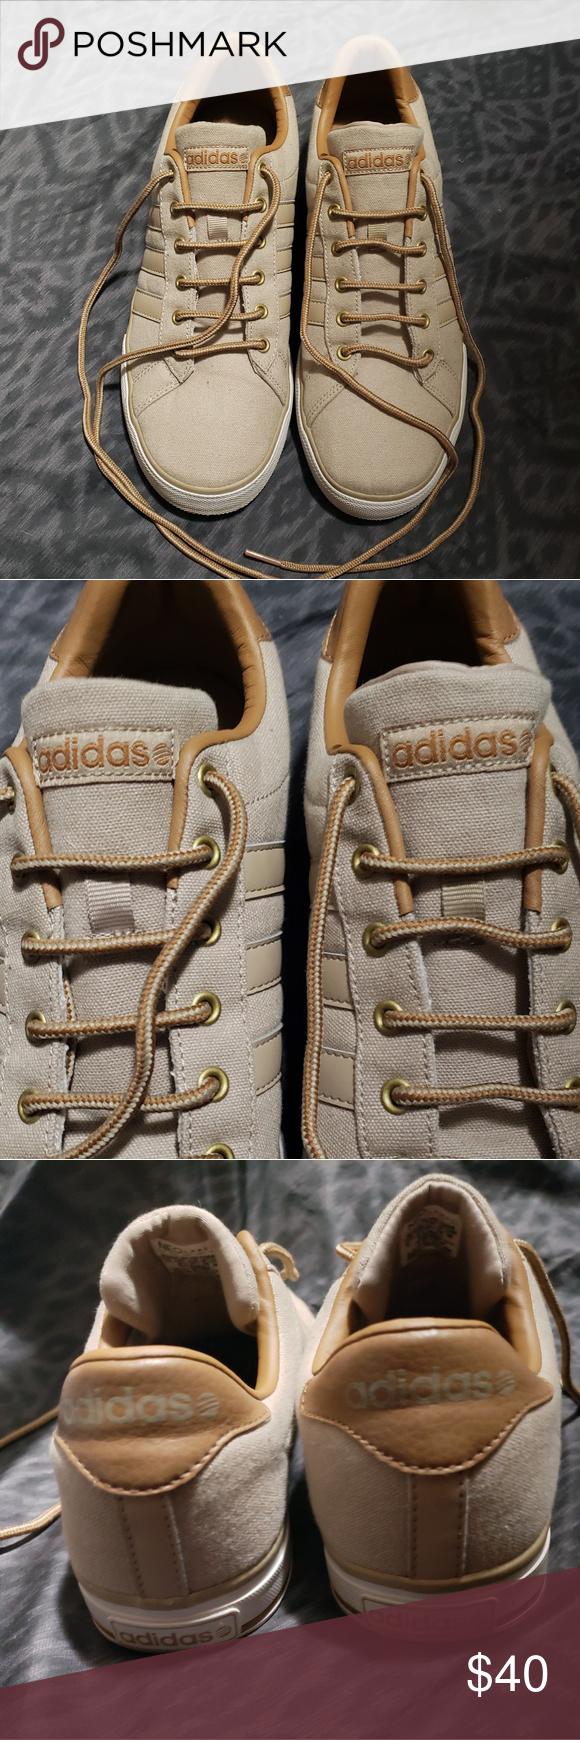 Adidas neo brown tan daily sneaker shoes Adidas neo khaki brown ...